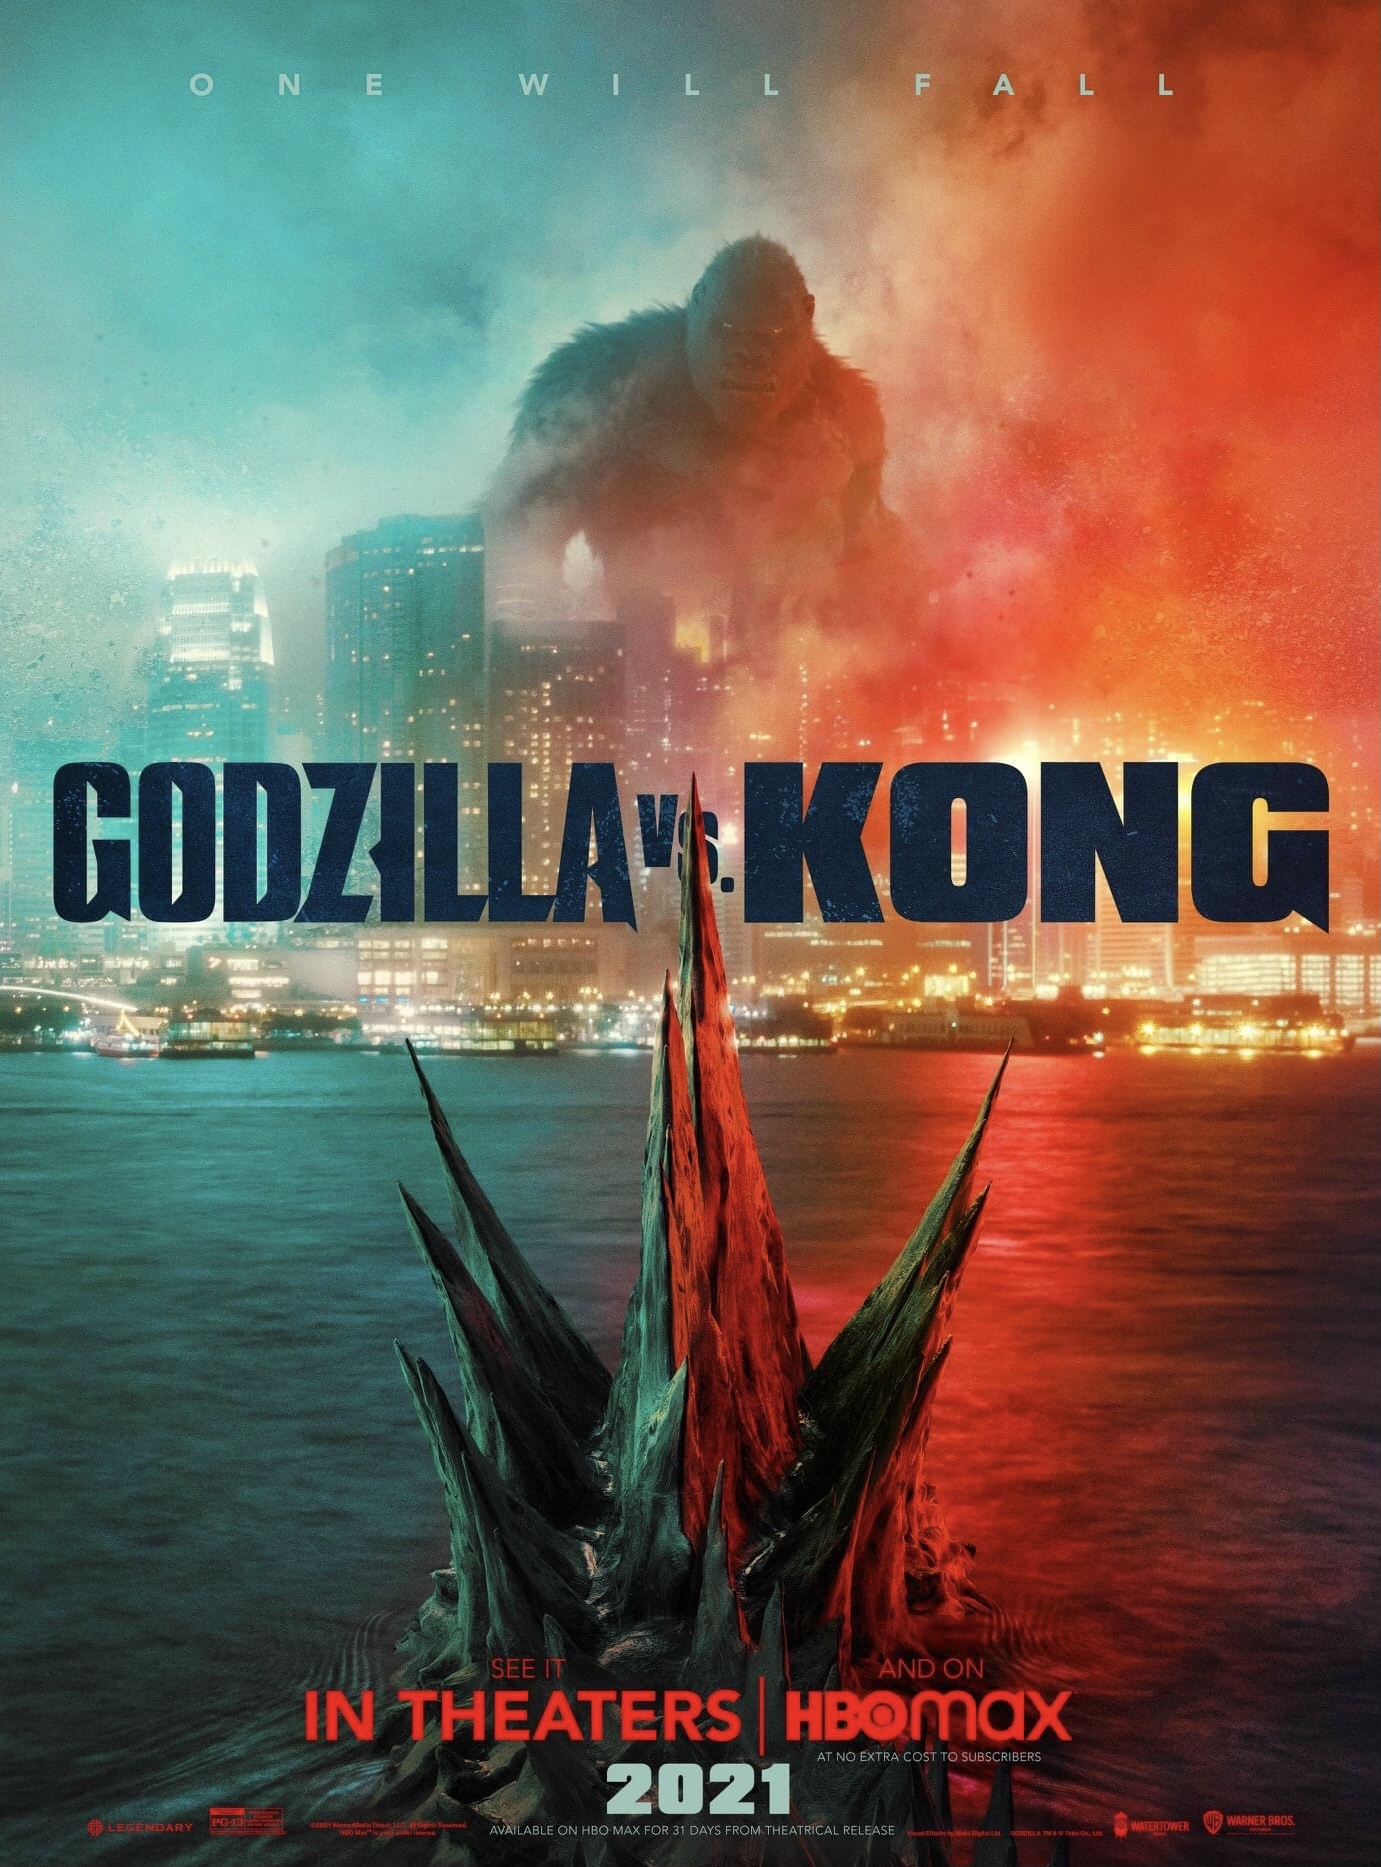 Godzilla vs Kong poster – movieMotion